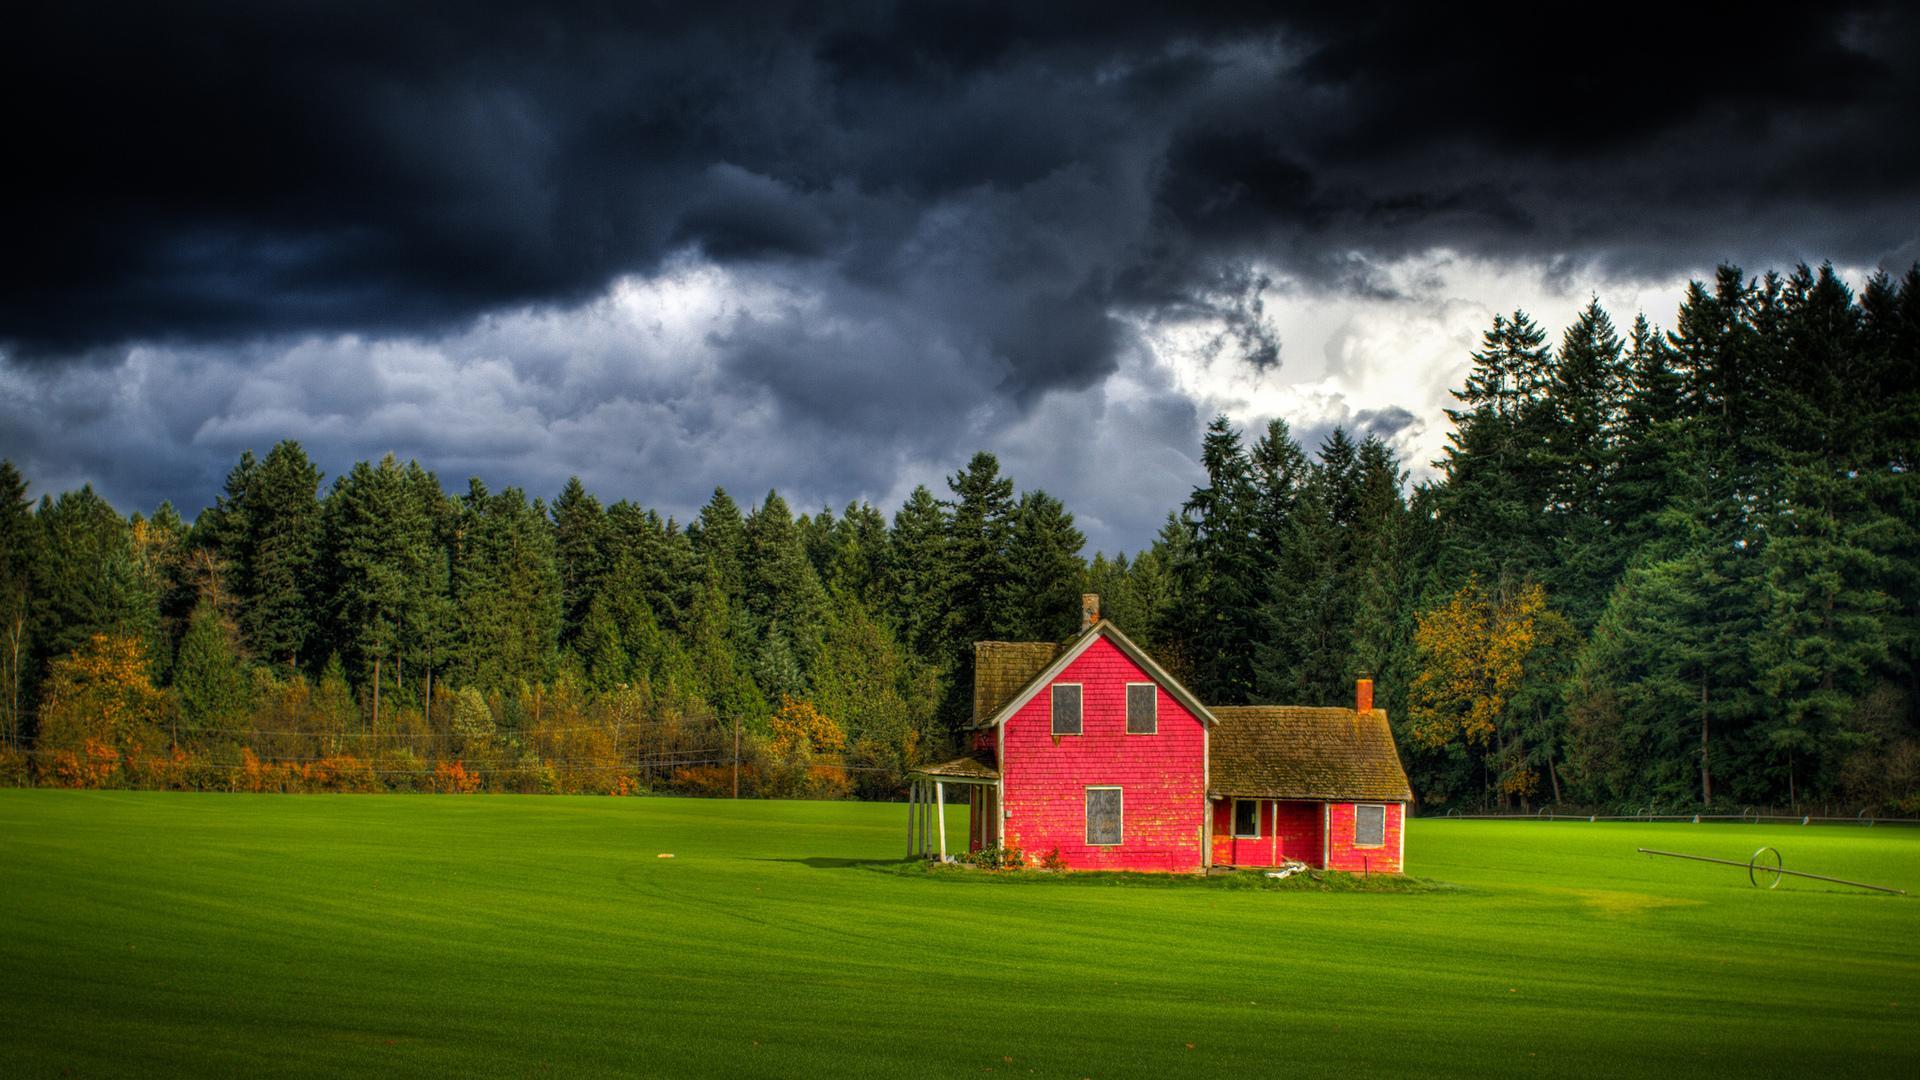 Farmhouse Wallpapers HD 1920x1080